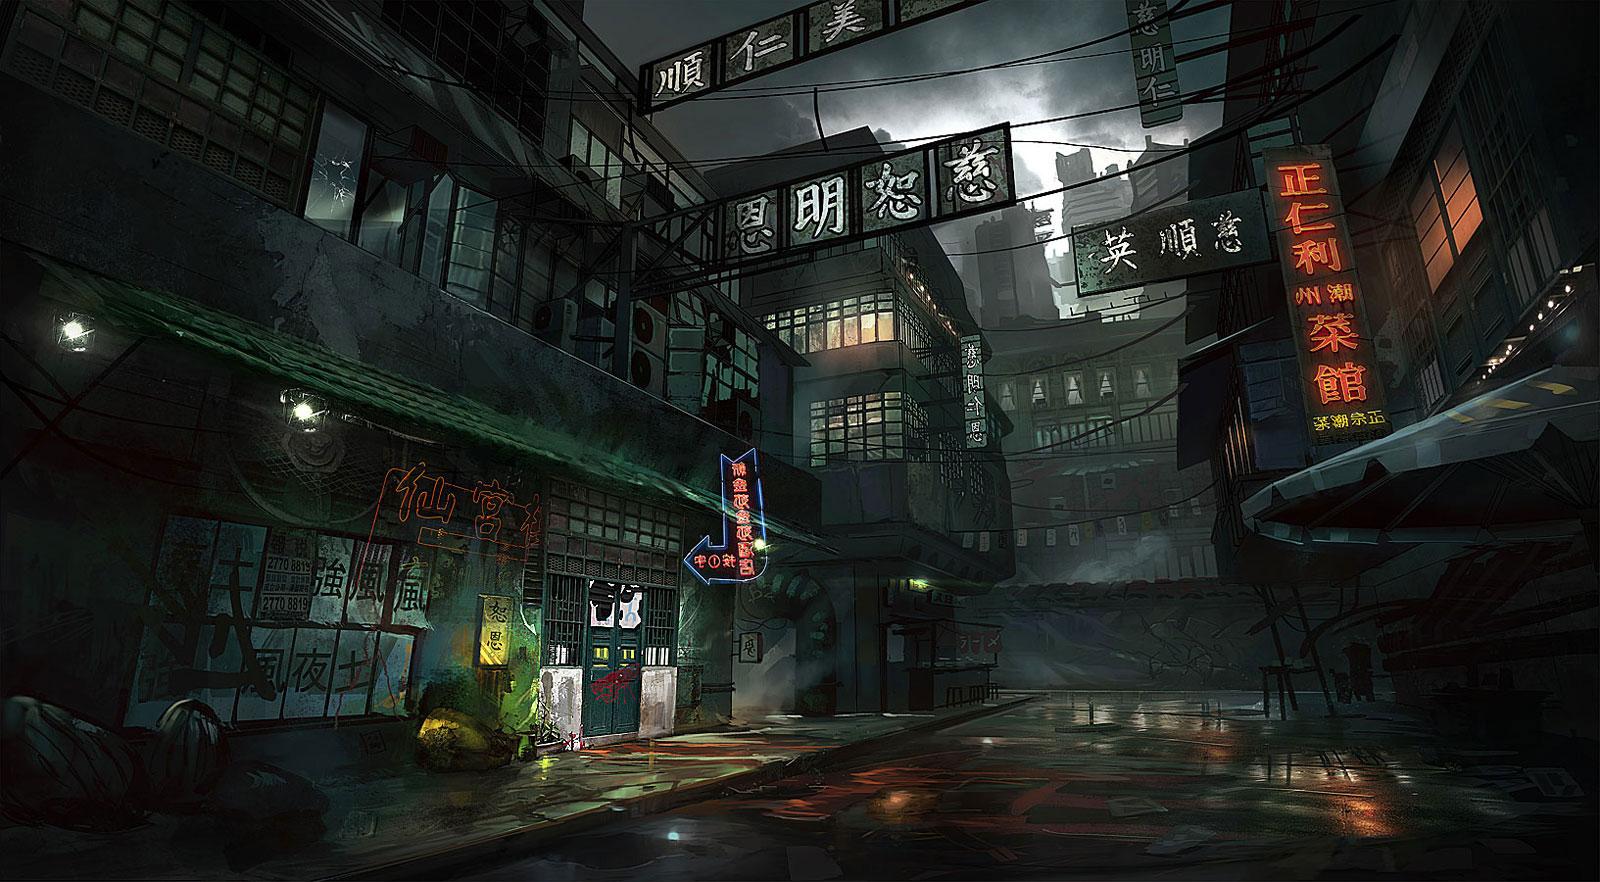 king tong street   digital paintings illustrations